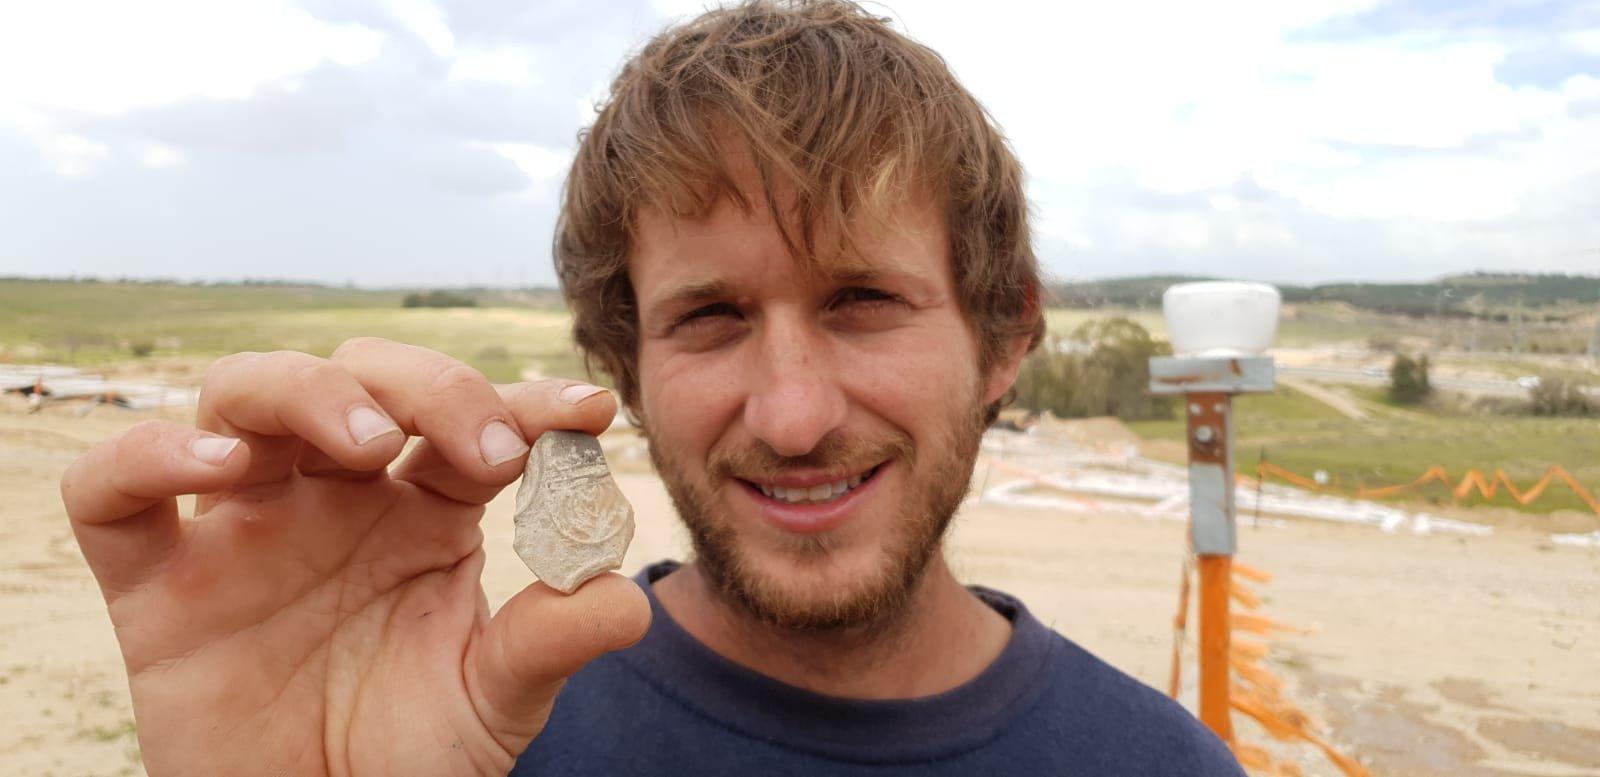 IAA Archaeologist Avinoam Lehavi holding the ancient Oil lamp sherd decorated with a menorah.